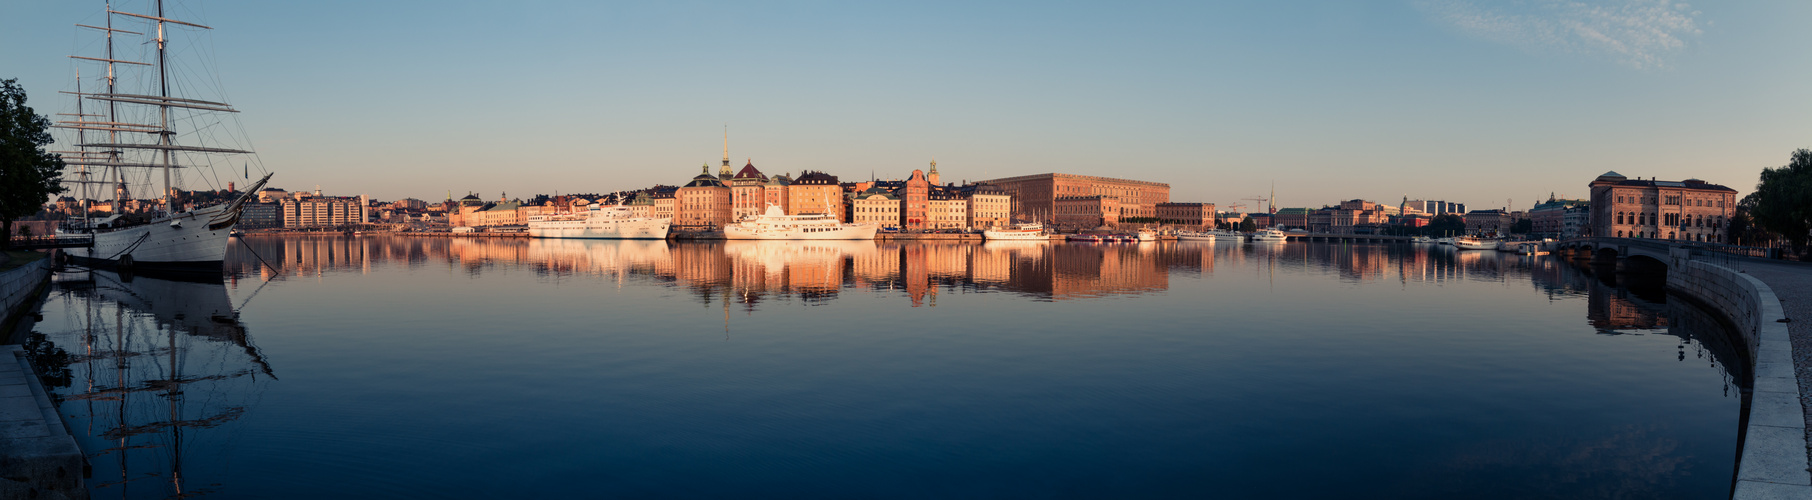 Sonnenaufgang in Stockholm